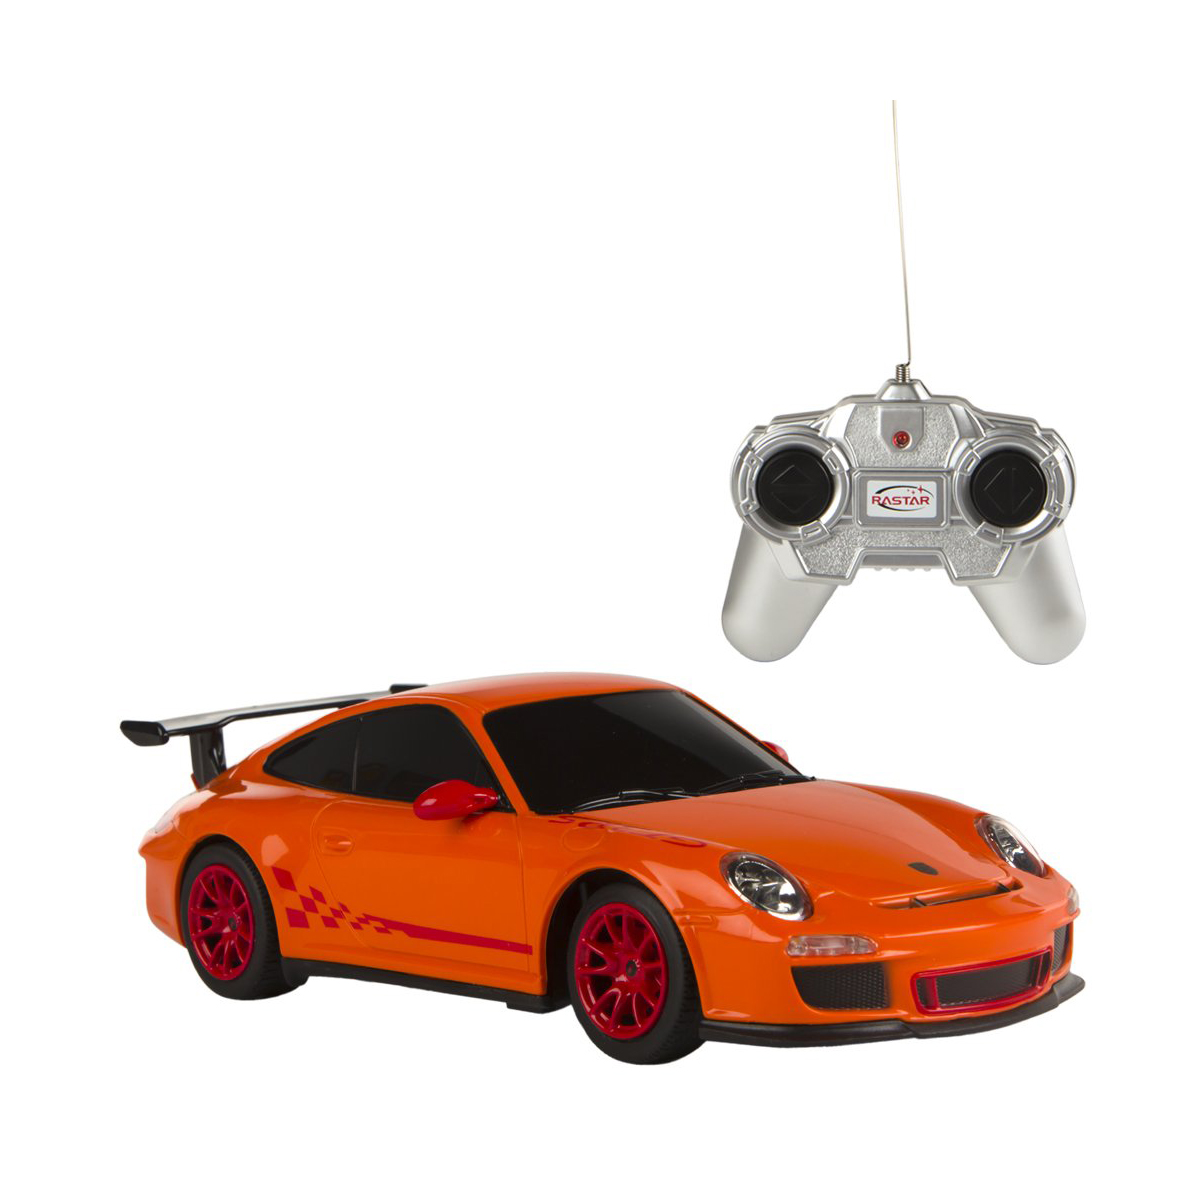 Masina cu telecomanda Rastar Porsche GT3 RS S, 1:24, Portocaliu